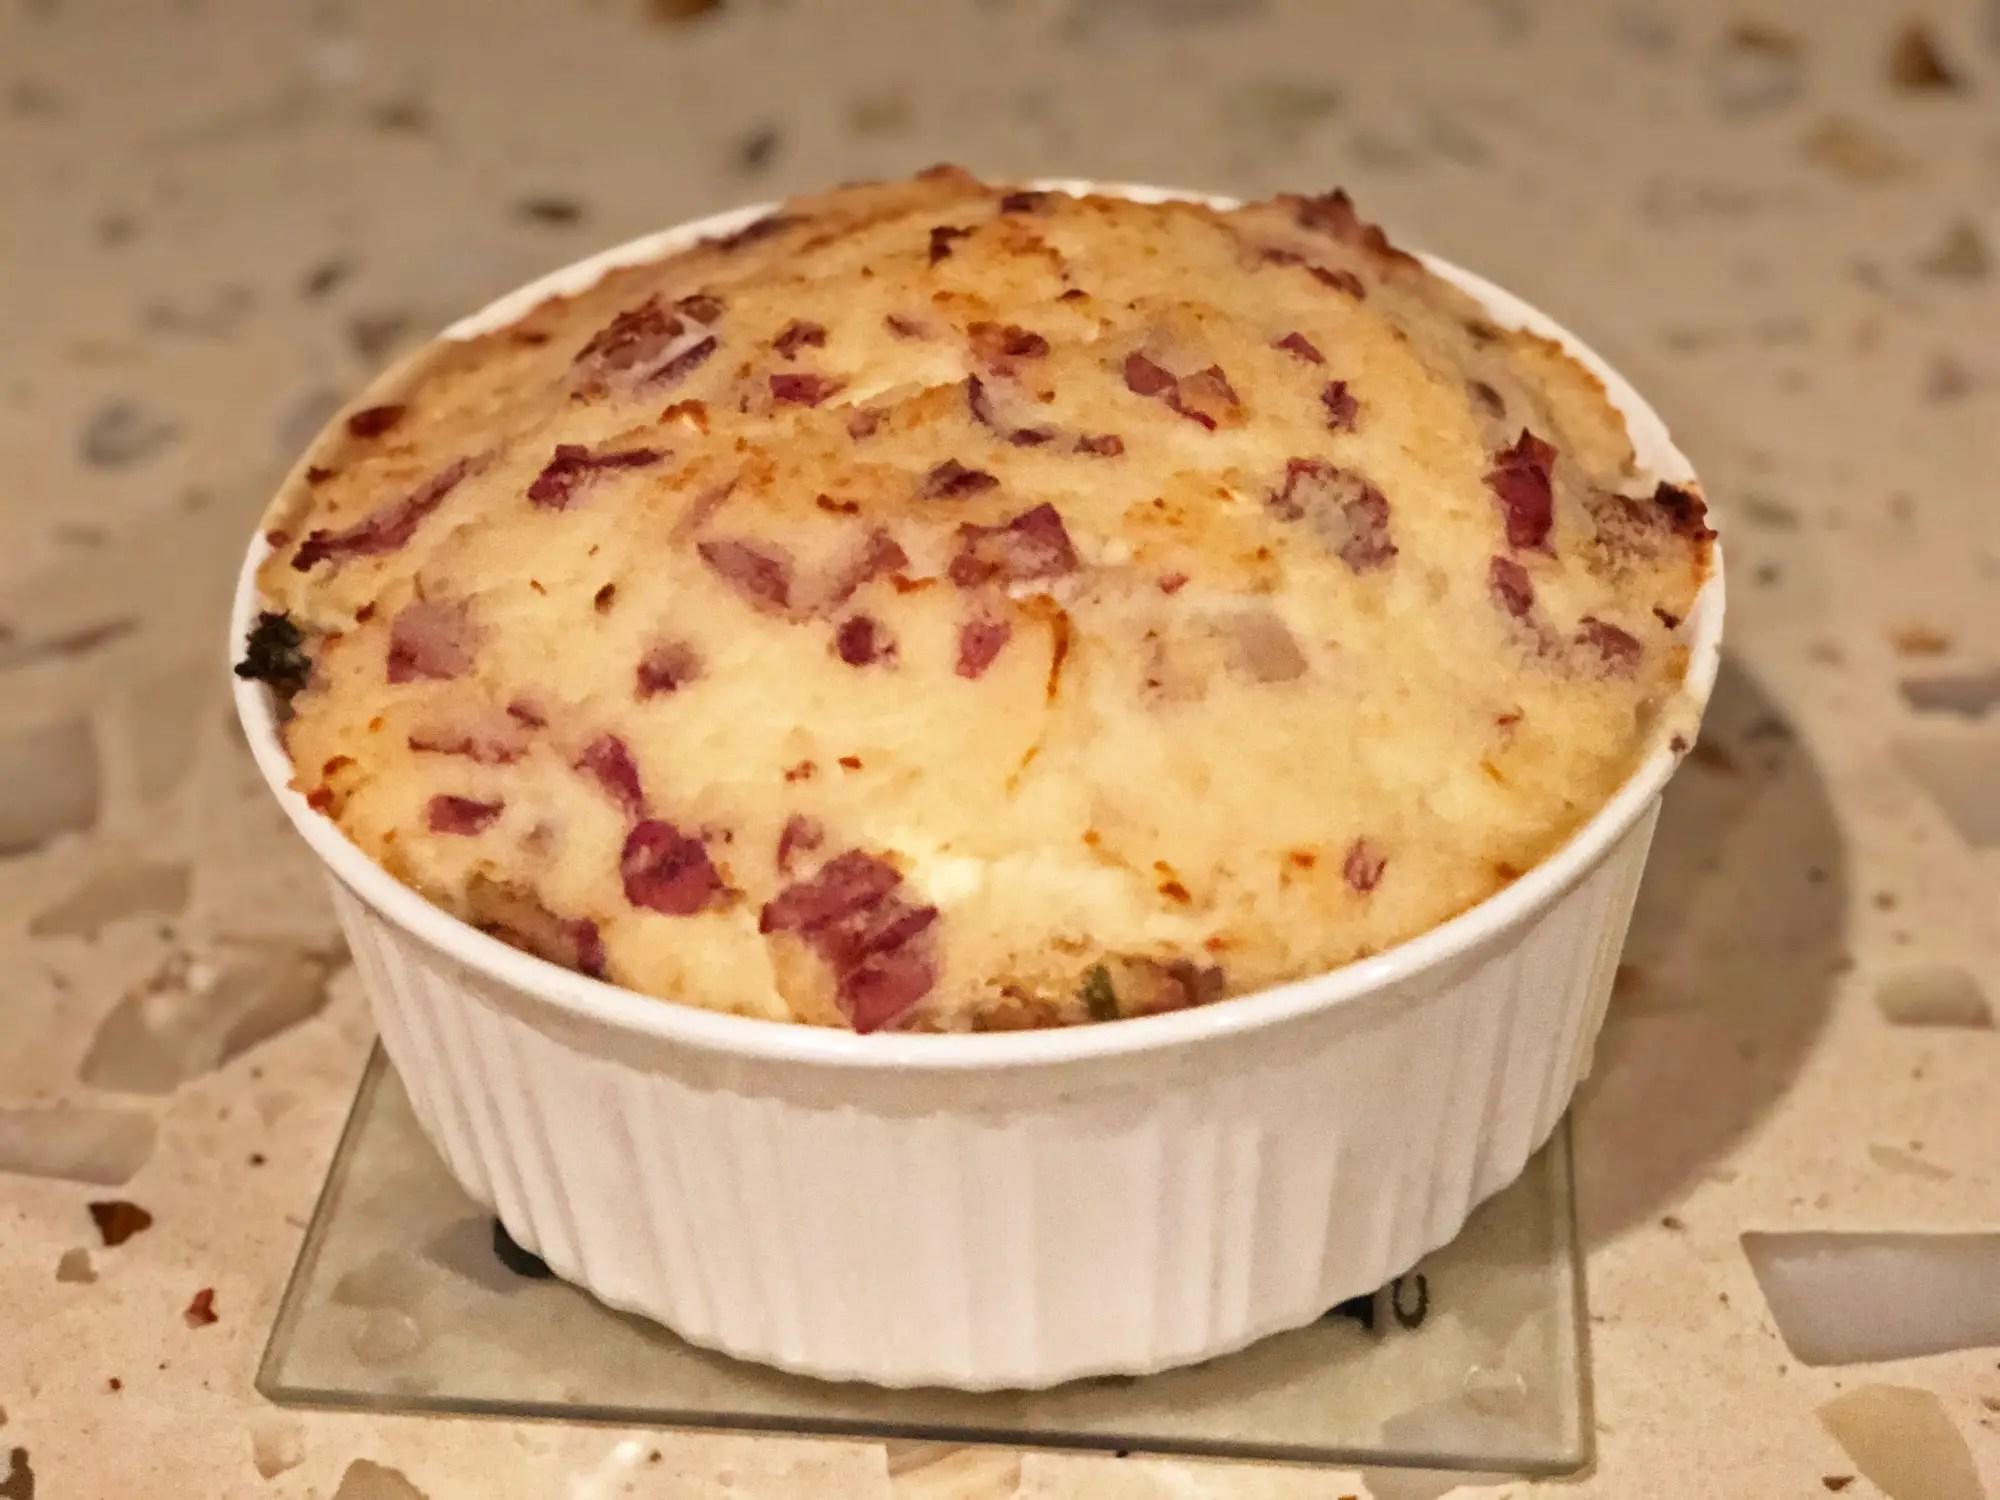 GEEK EATS: Leftover Thanksgiving Meal Shepherd's Pie